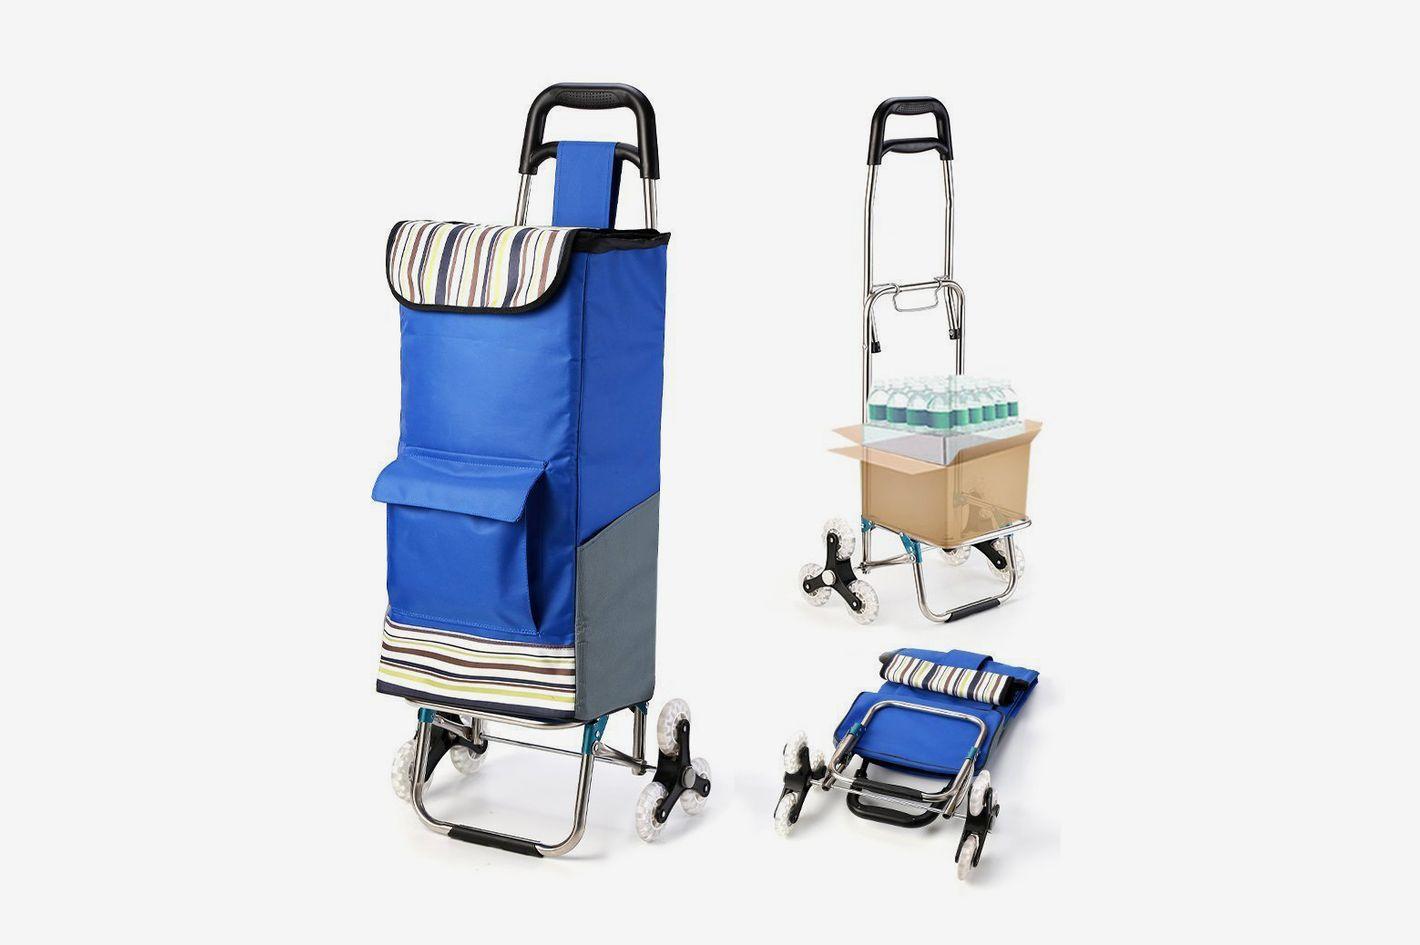 Royi Stair Climbing Laundry Utility Cart